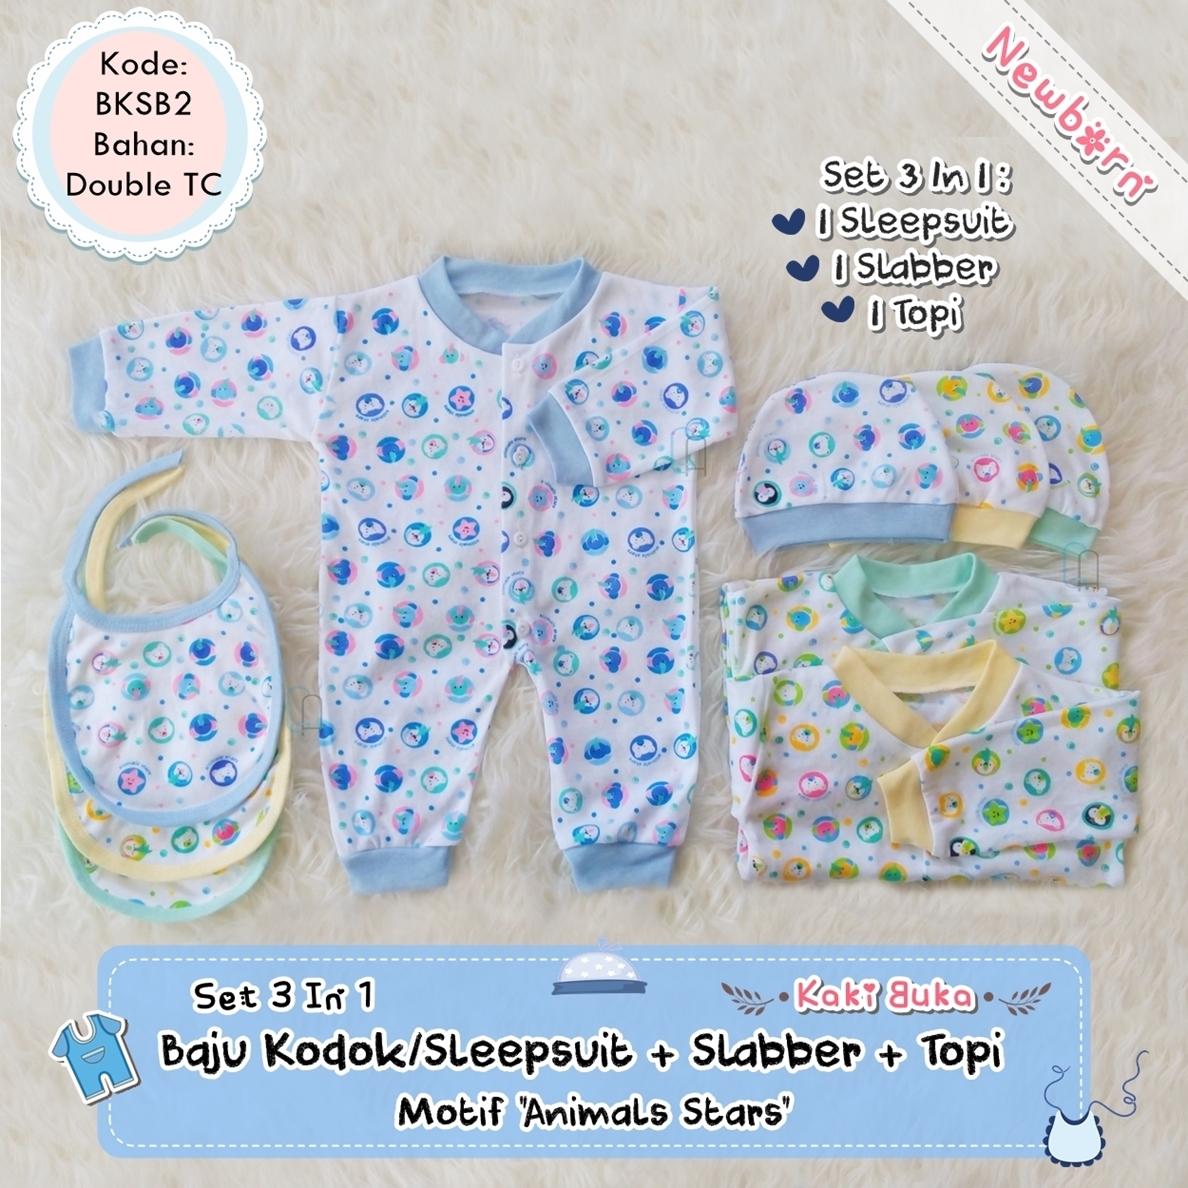 Jual Set Baju Kodok Sleepsuit Kaki Buka + Slabber +topi Kupluk Bayi ... 0a42d7f360